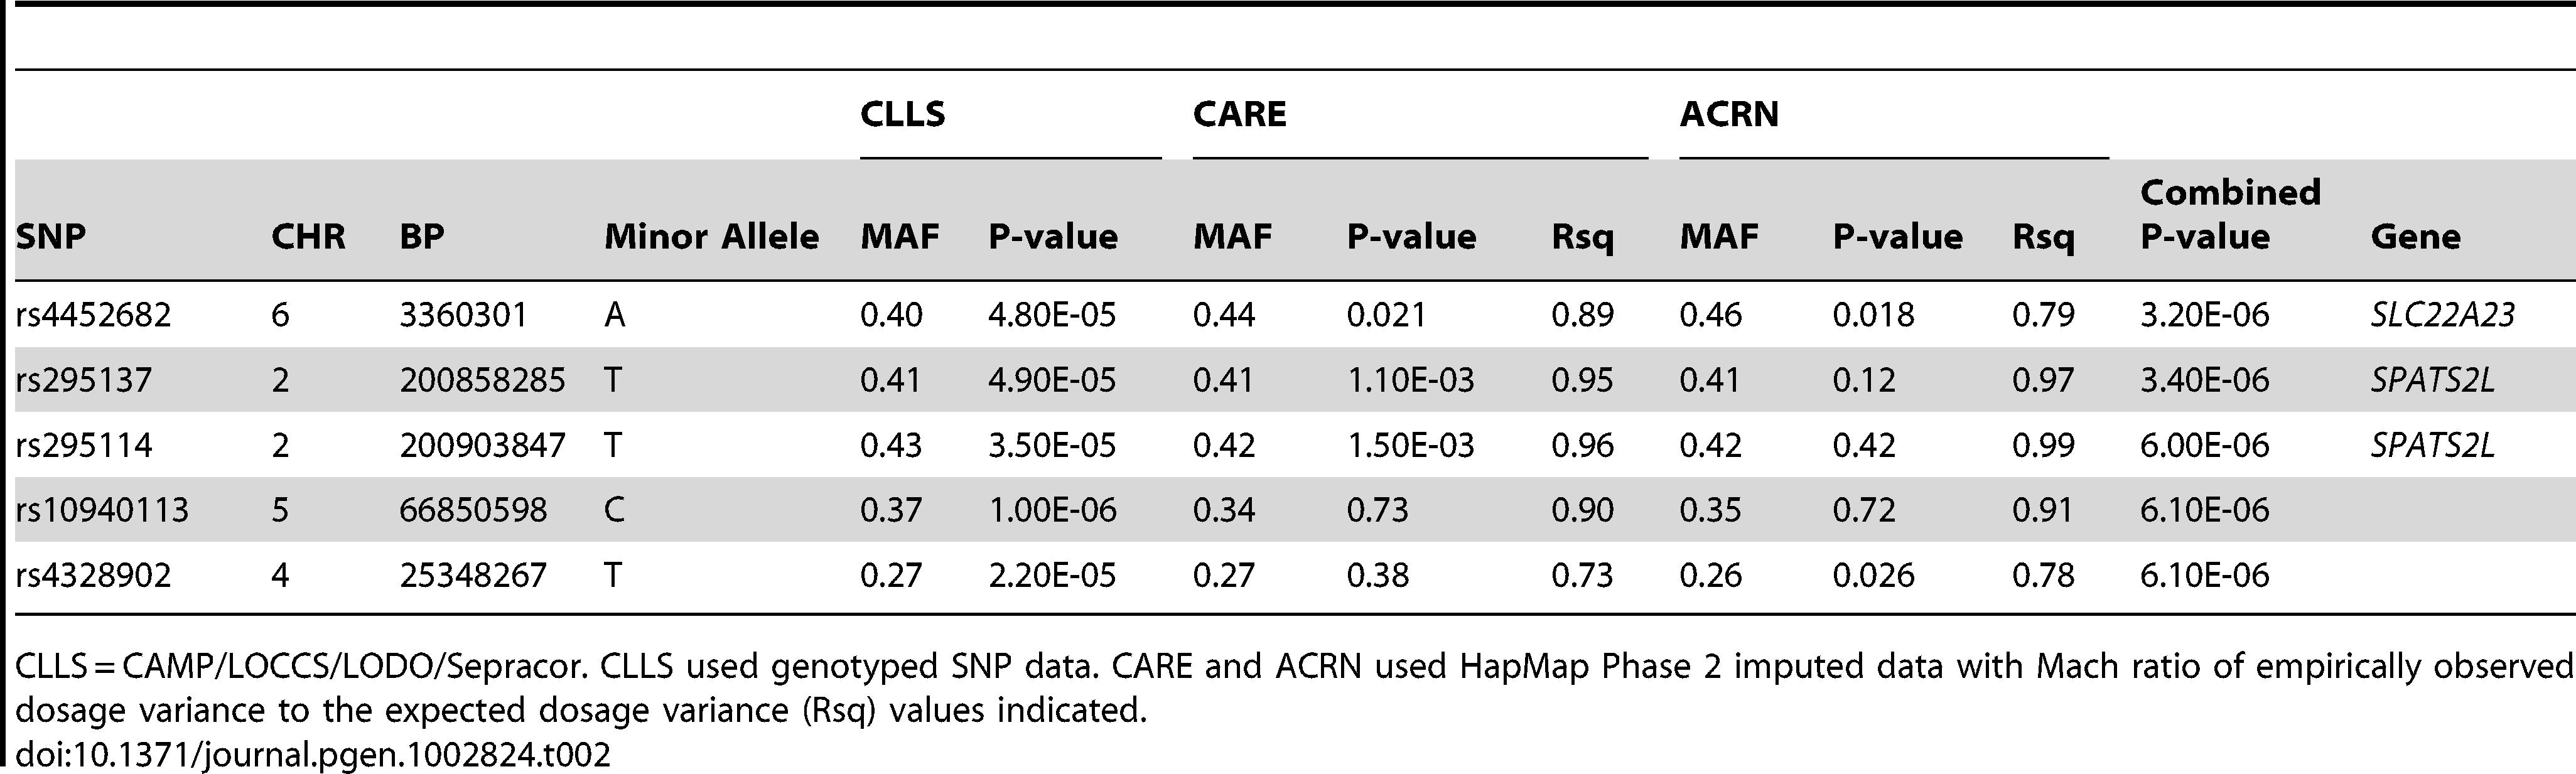 Primary GWAS Top <em class=&quot;ref&quot;>Results</em> (SNPs with Combined P-values &lt;1e-05).